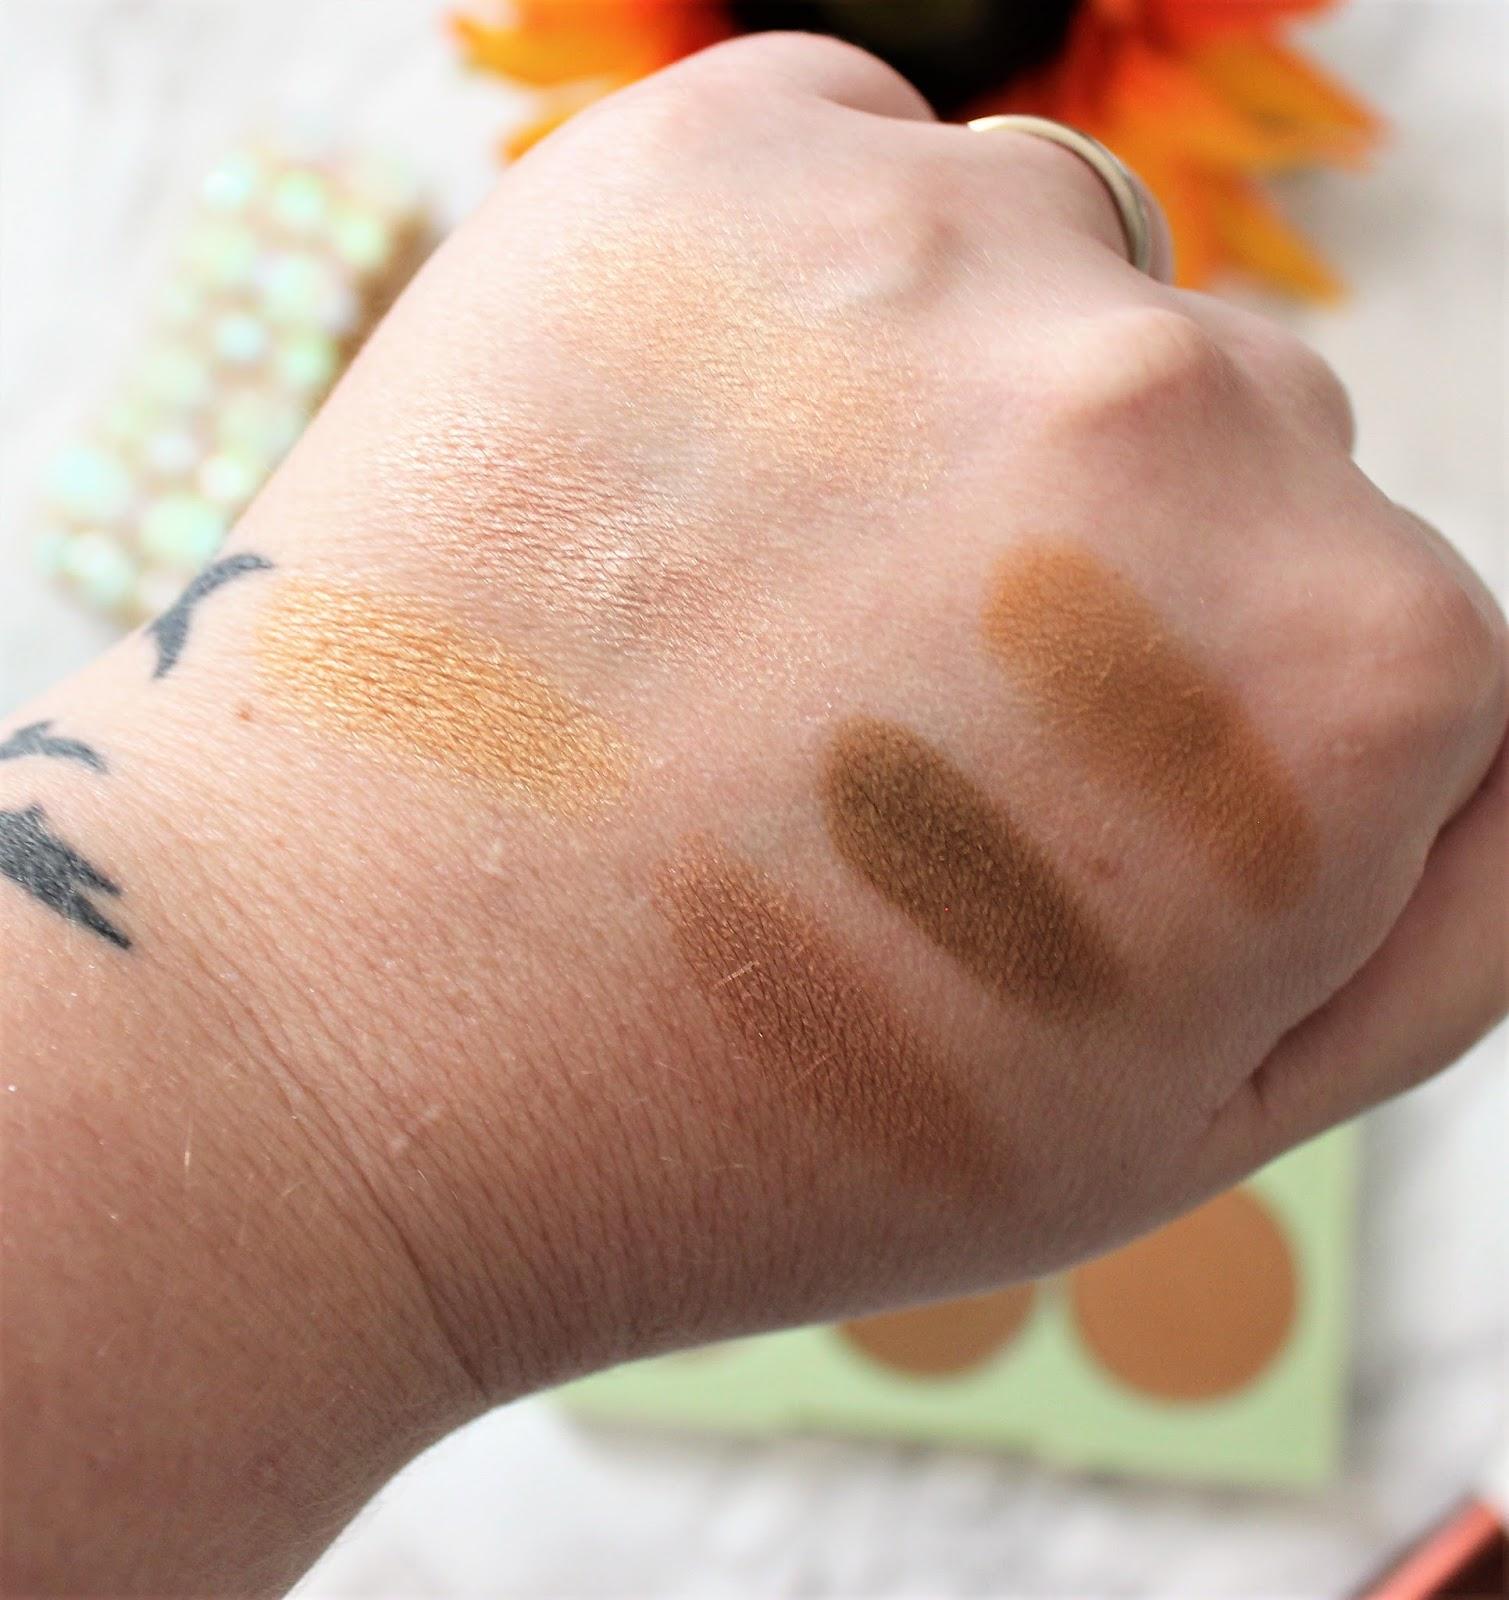 Pixi Beauty bronze & strobe palette swatches